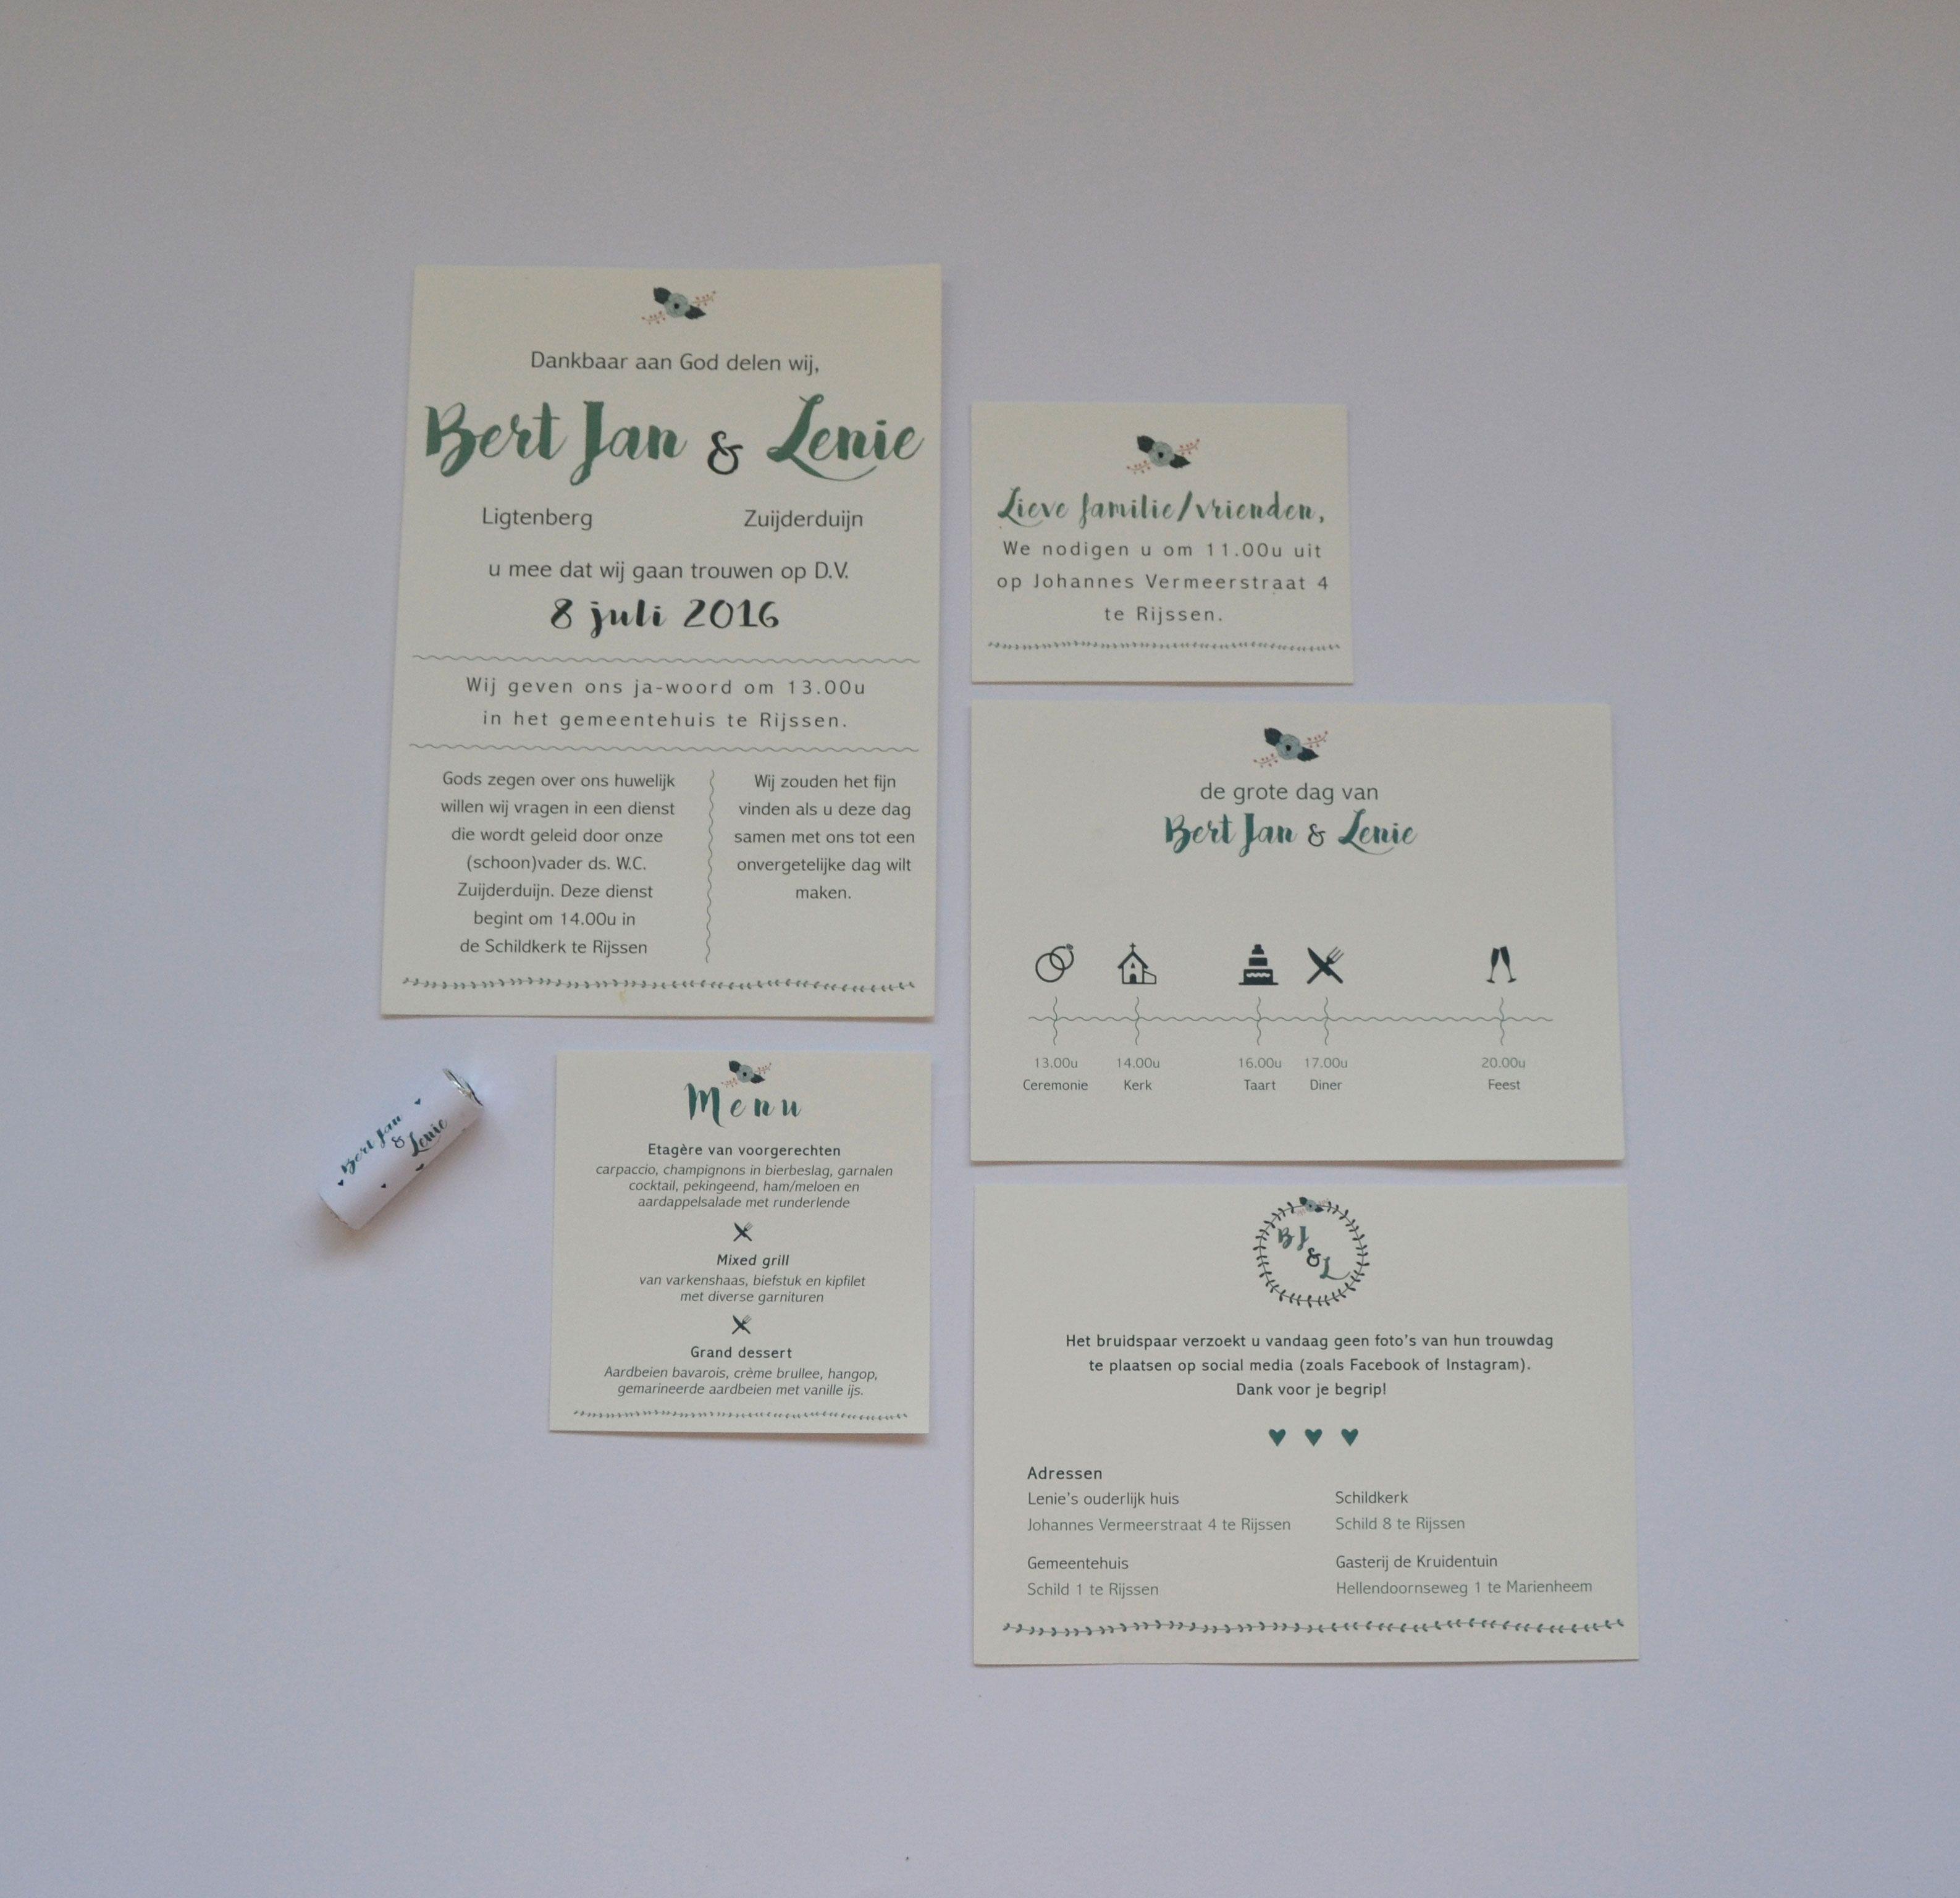 Trouwkaart Lenie & Bert Jan   design by PAPER & INK -    #Wedding #Invitation #Handmade #Trouwkaart #Trouwen #Inspiratie #Bruiloft #Touw #Mint #Stationary #MintToBe #Floral #menu #dayprogram #pepermint